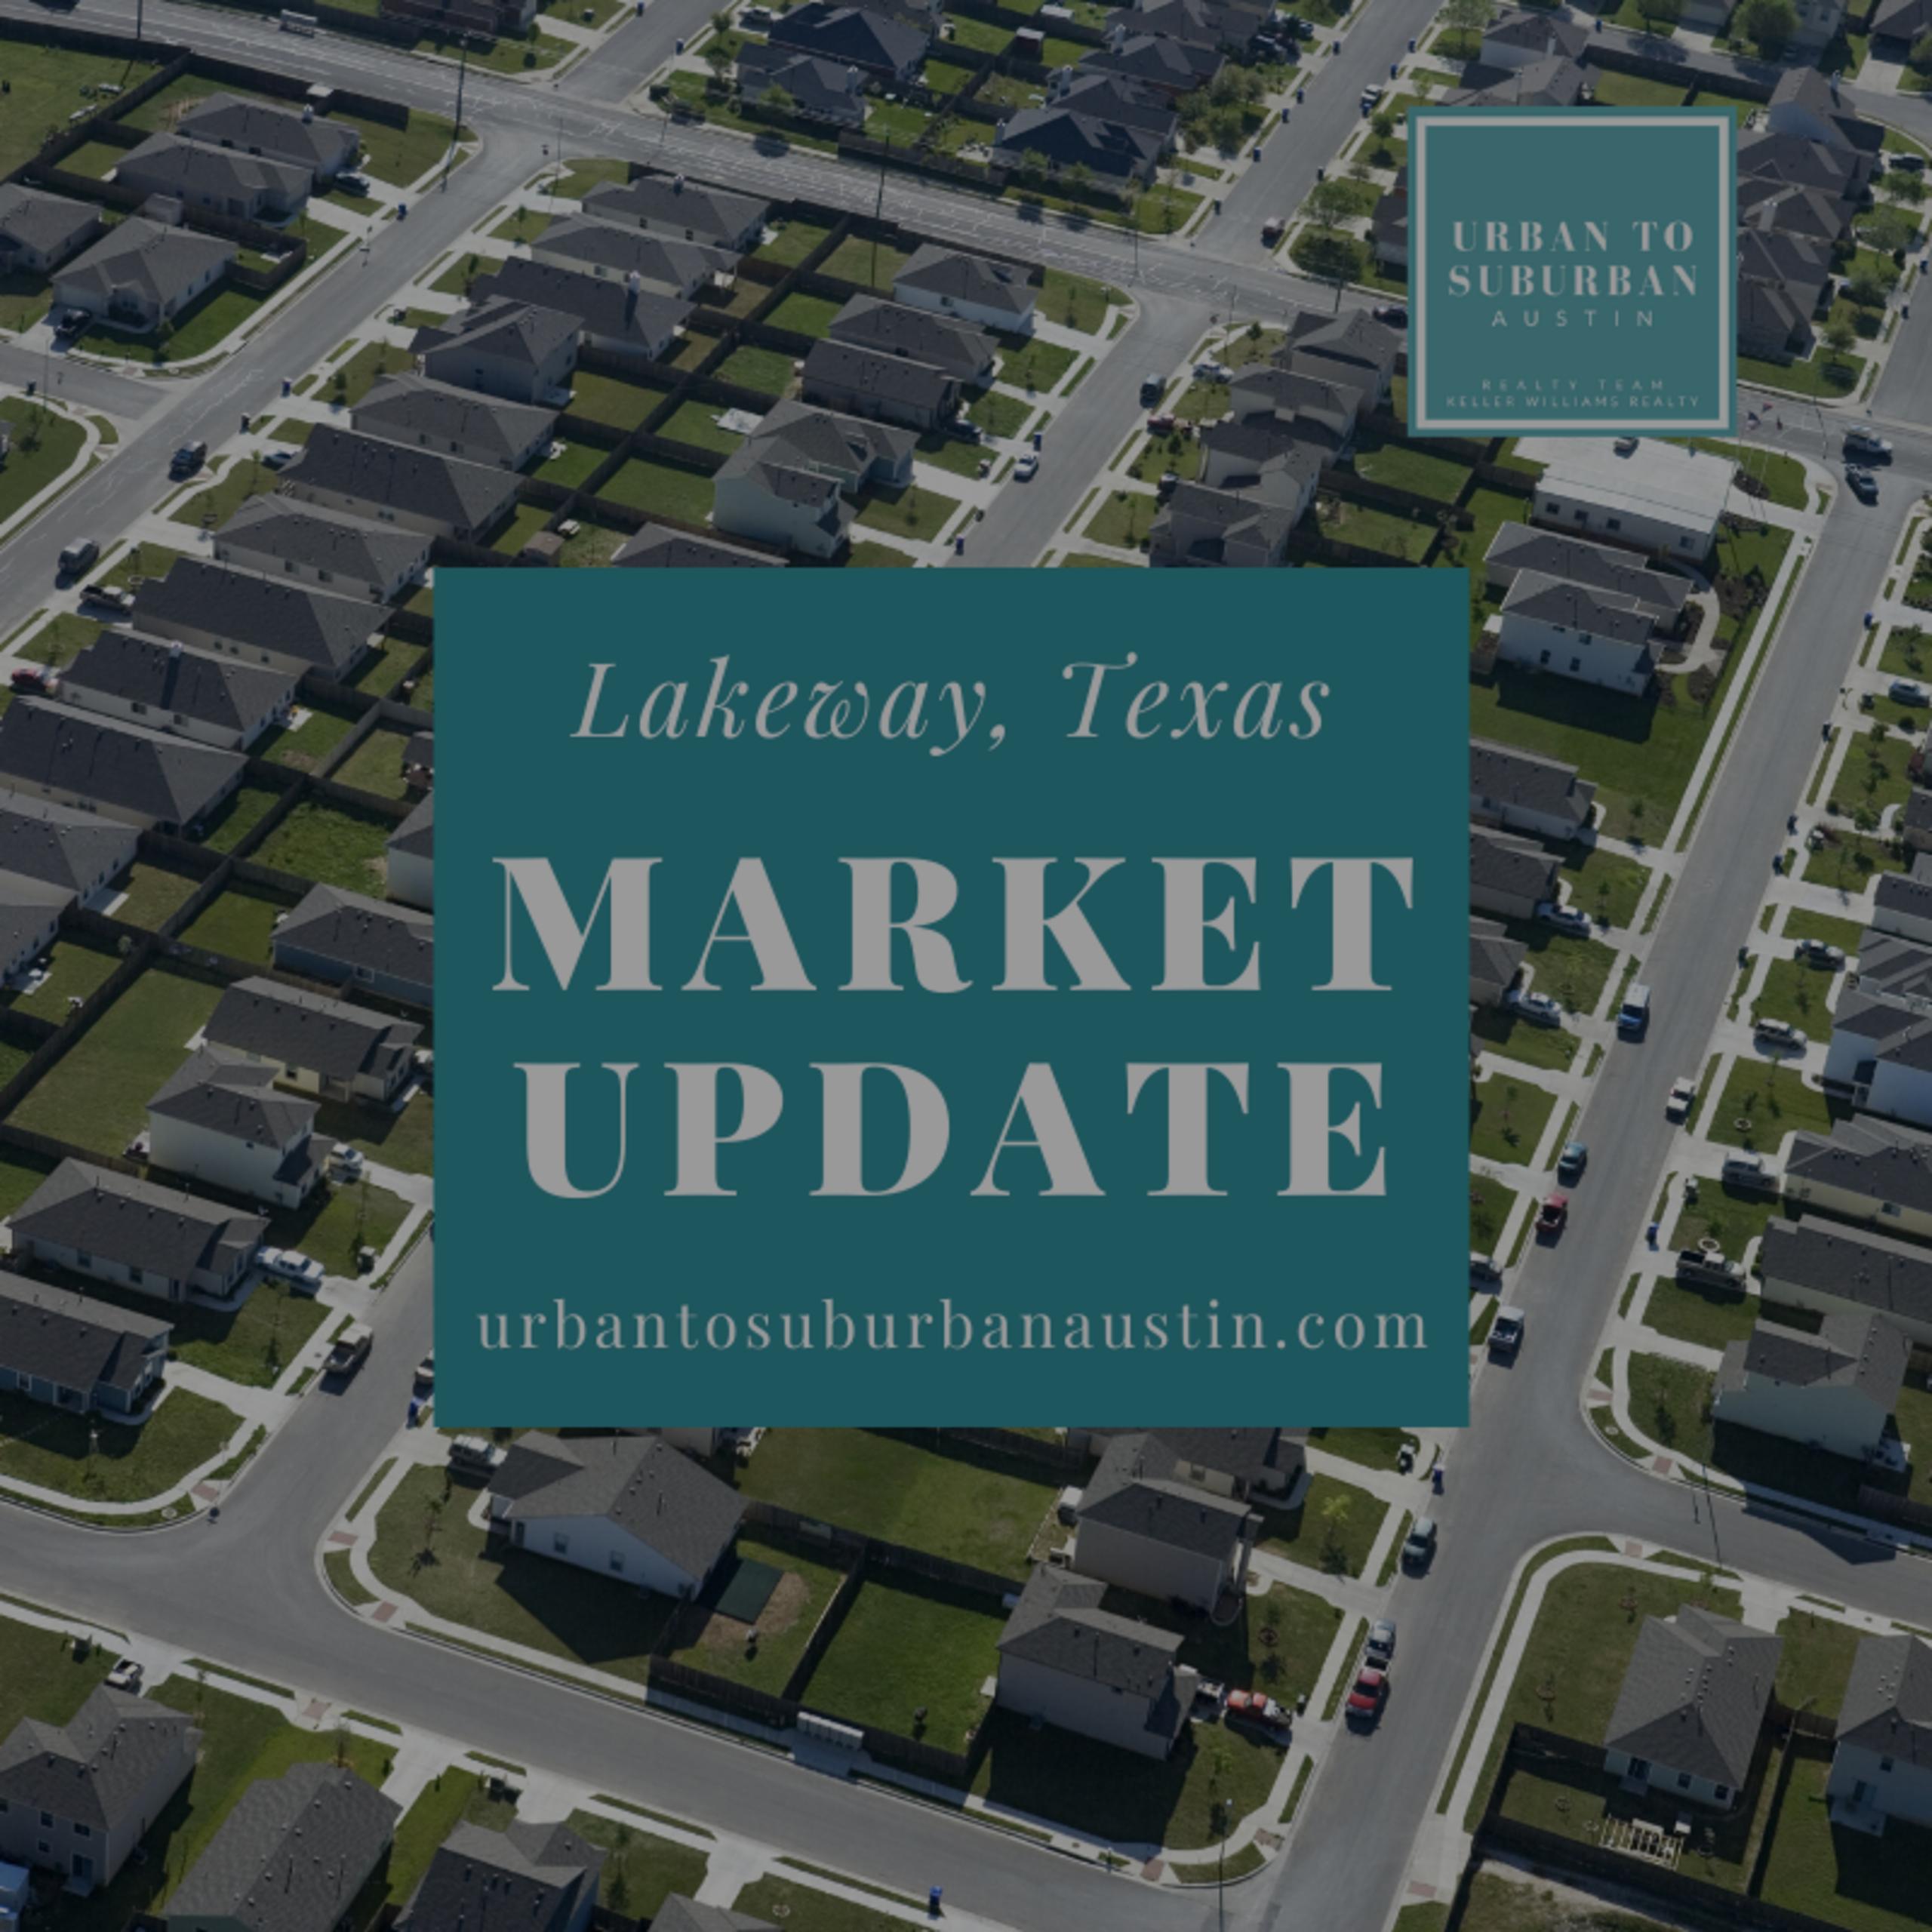 Lakeway, Texas Housing Market Update for November 2019